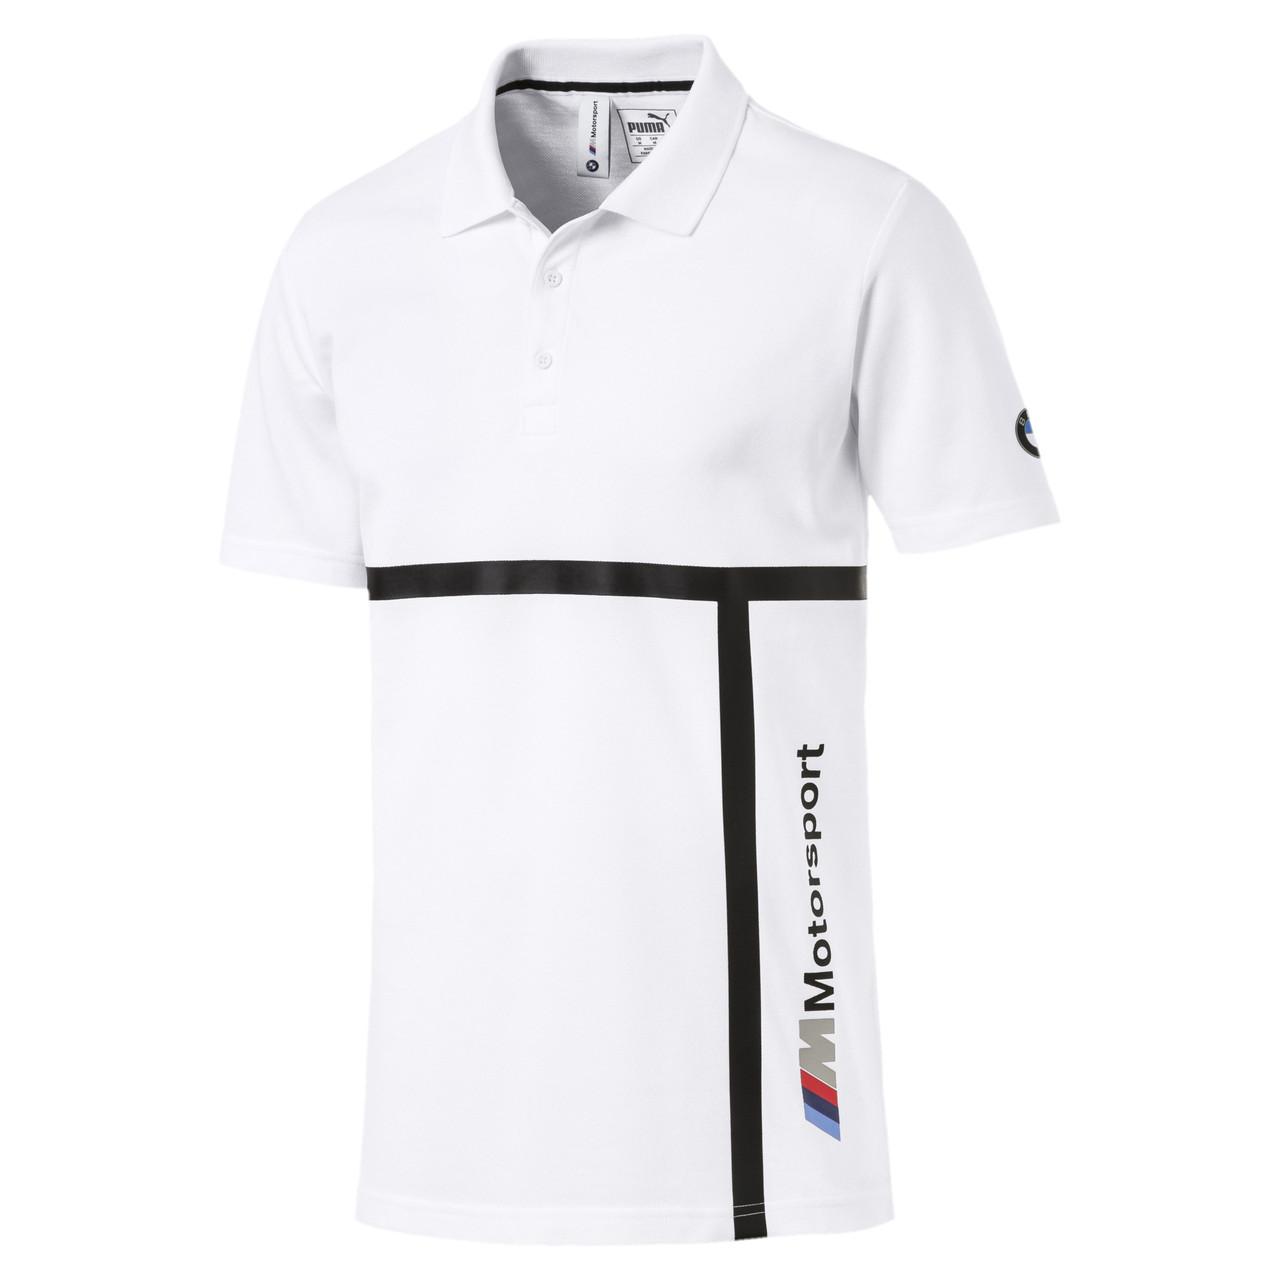 Мужская спортивная футболка поло Bmw Mms Polo